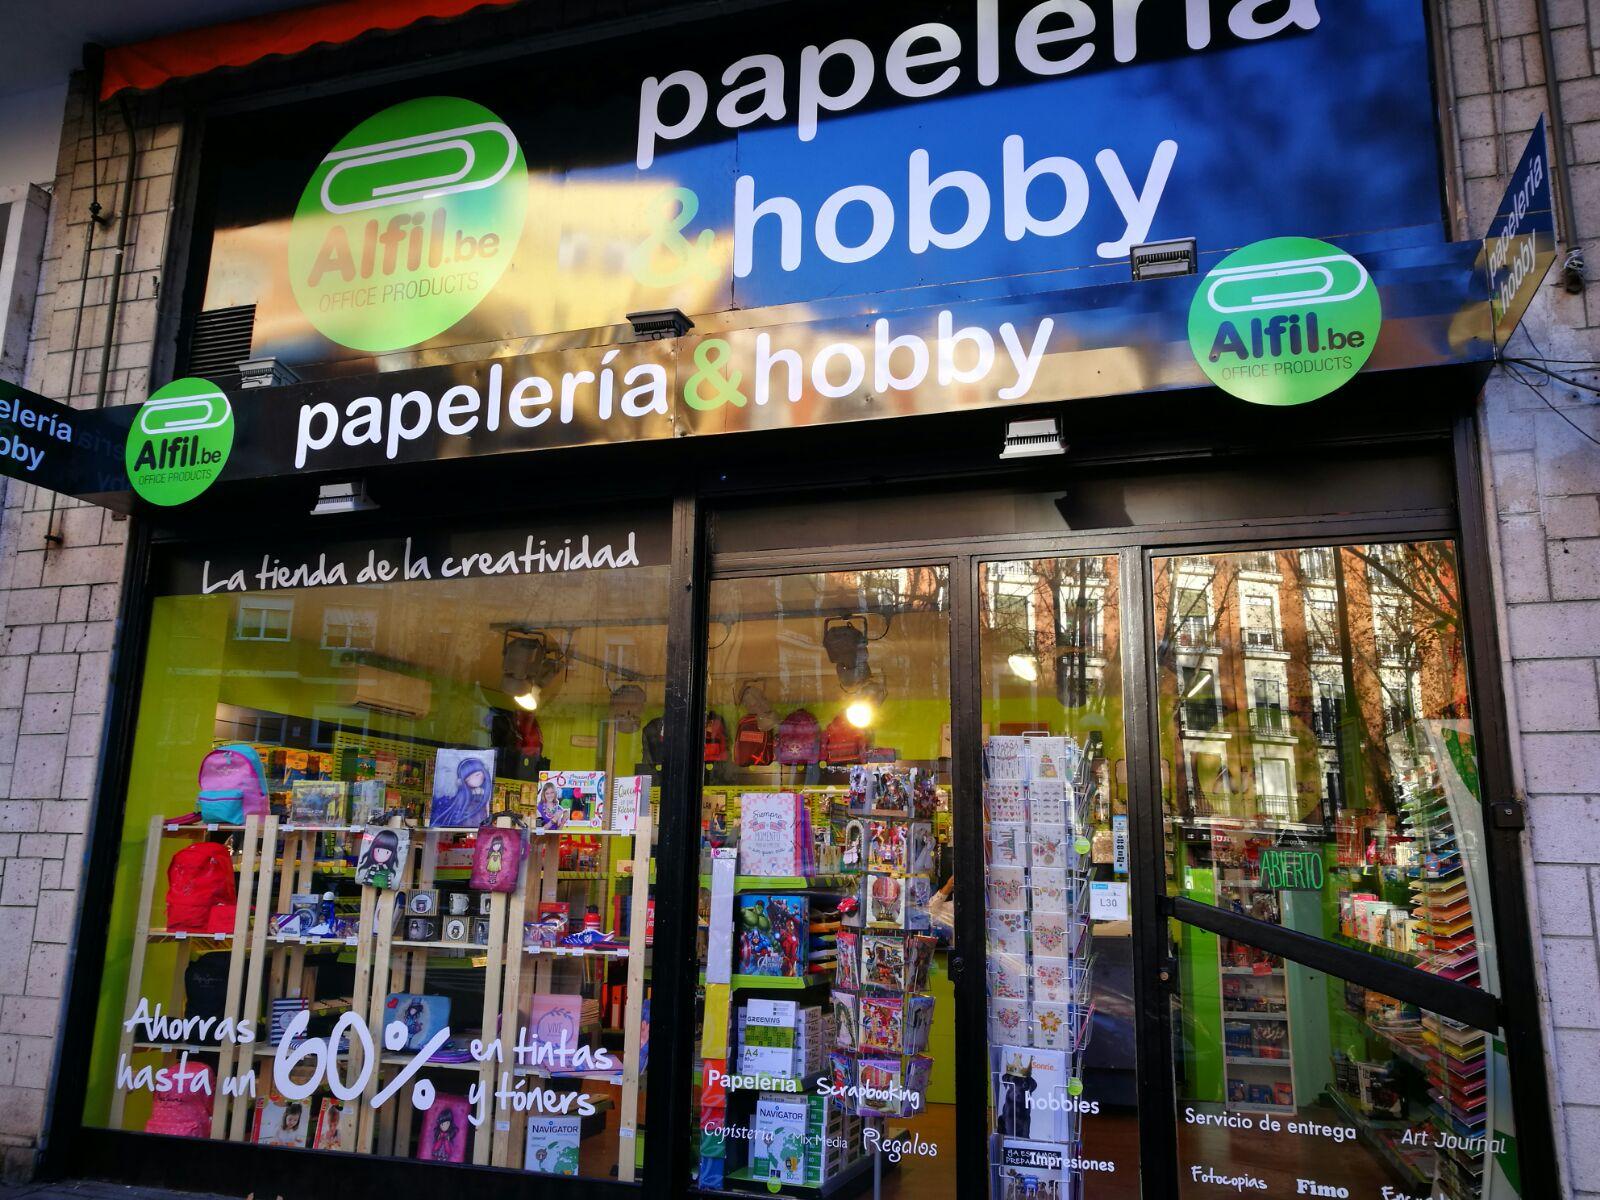 Alfil.be papeleria & hobby inaugura en Atocha